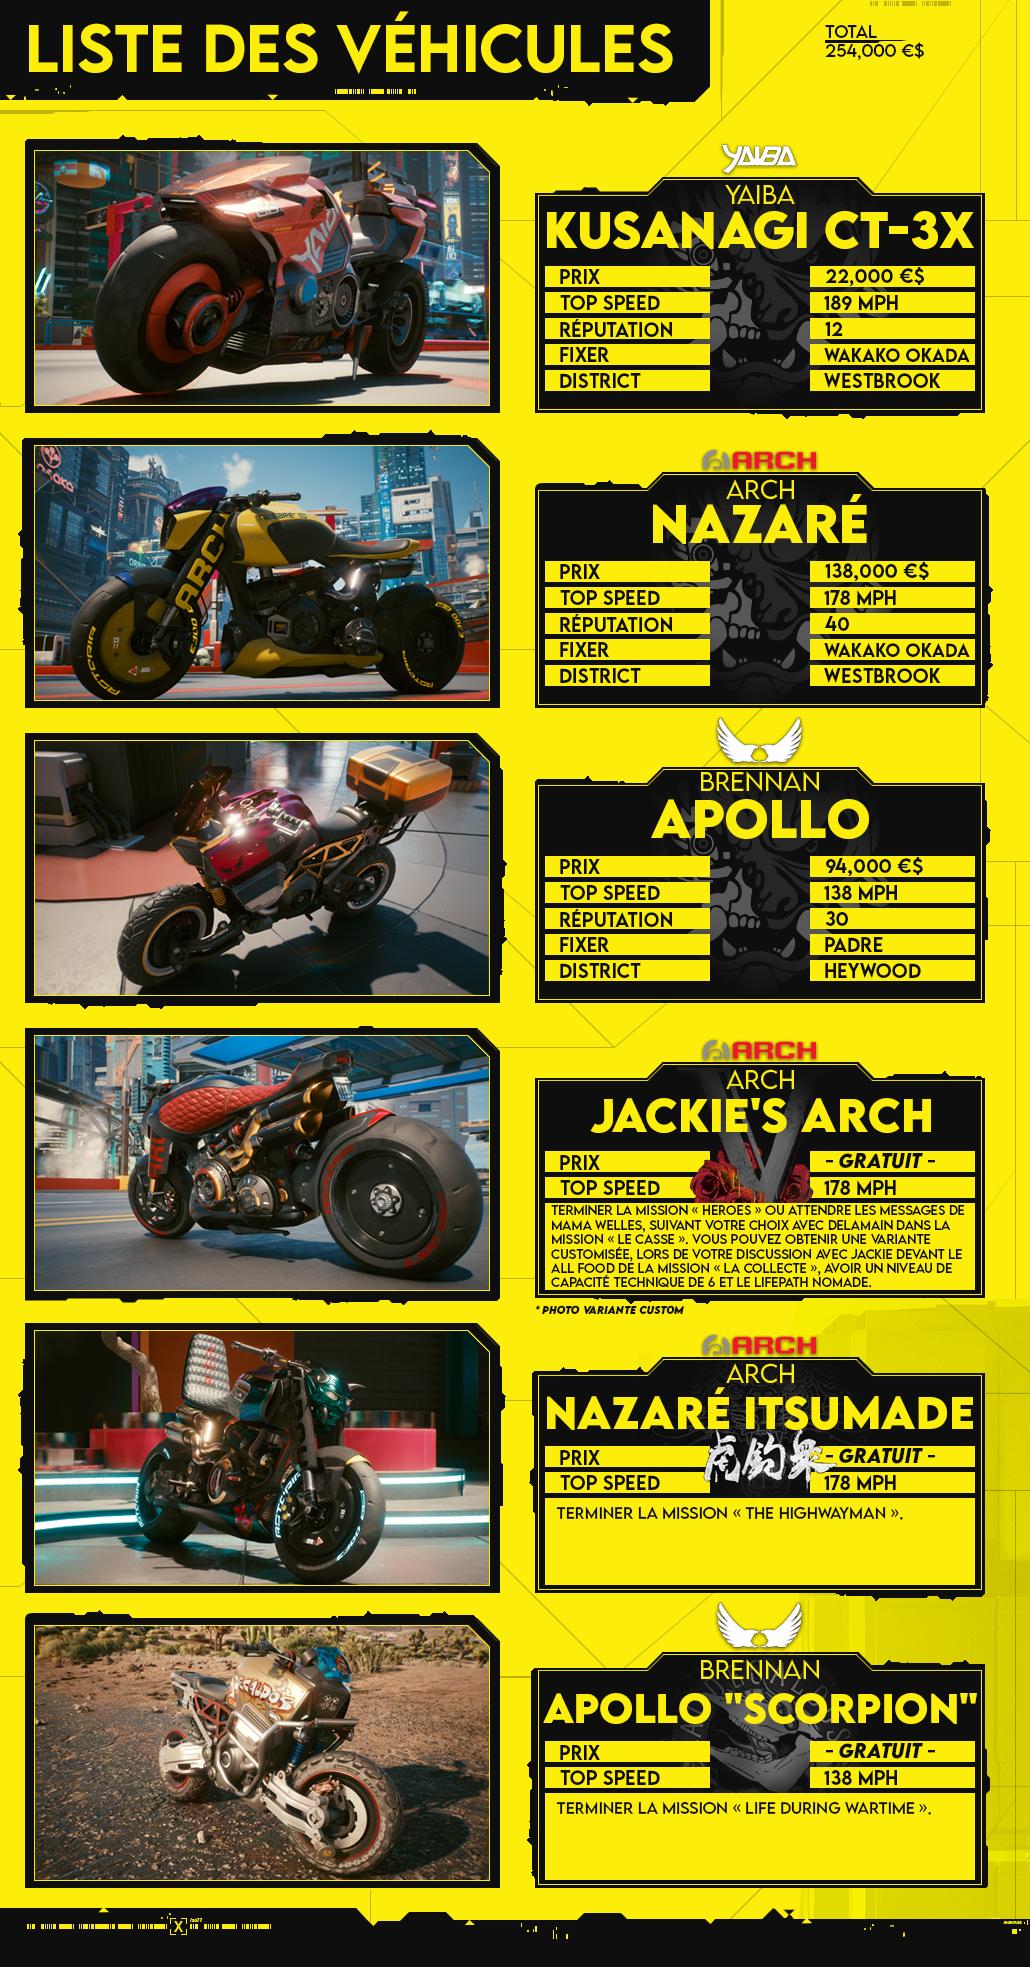 Cyberpunk 2077 liste des motos fiche by HAXIO.png